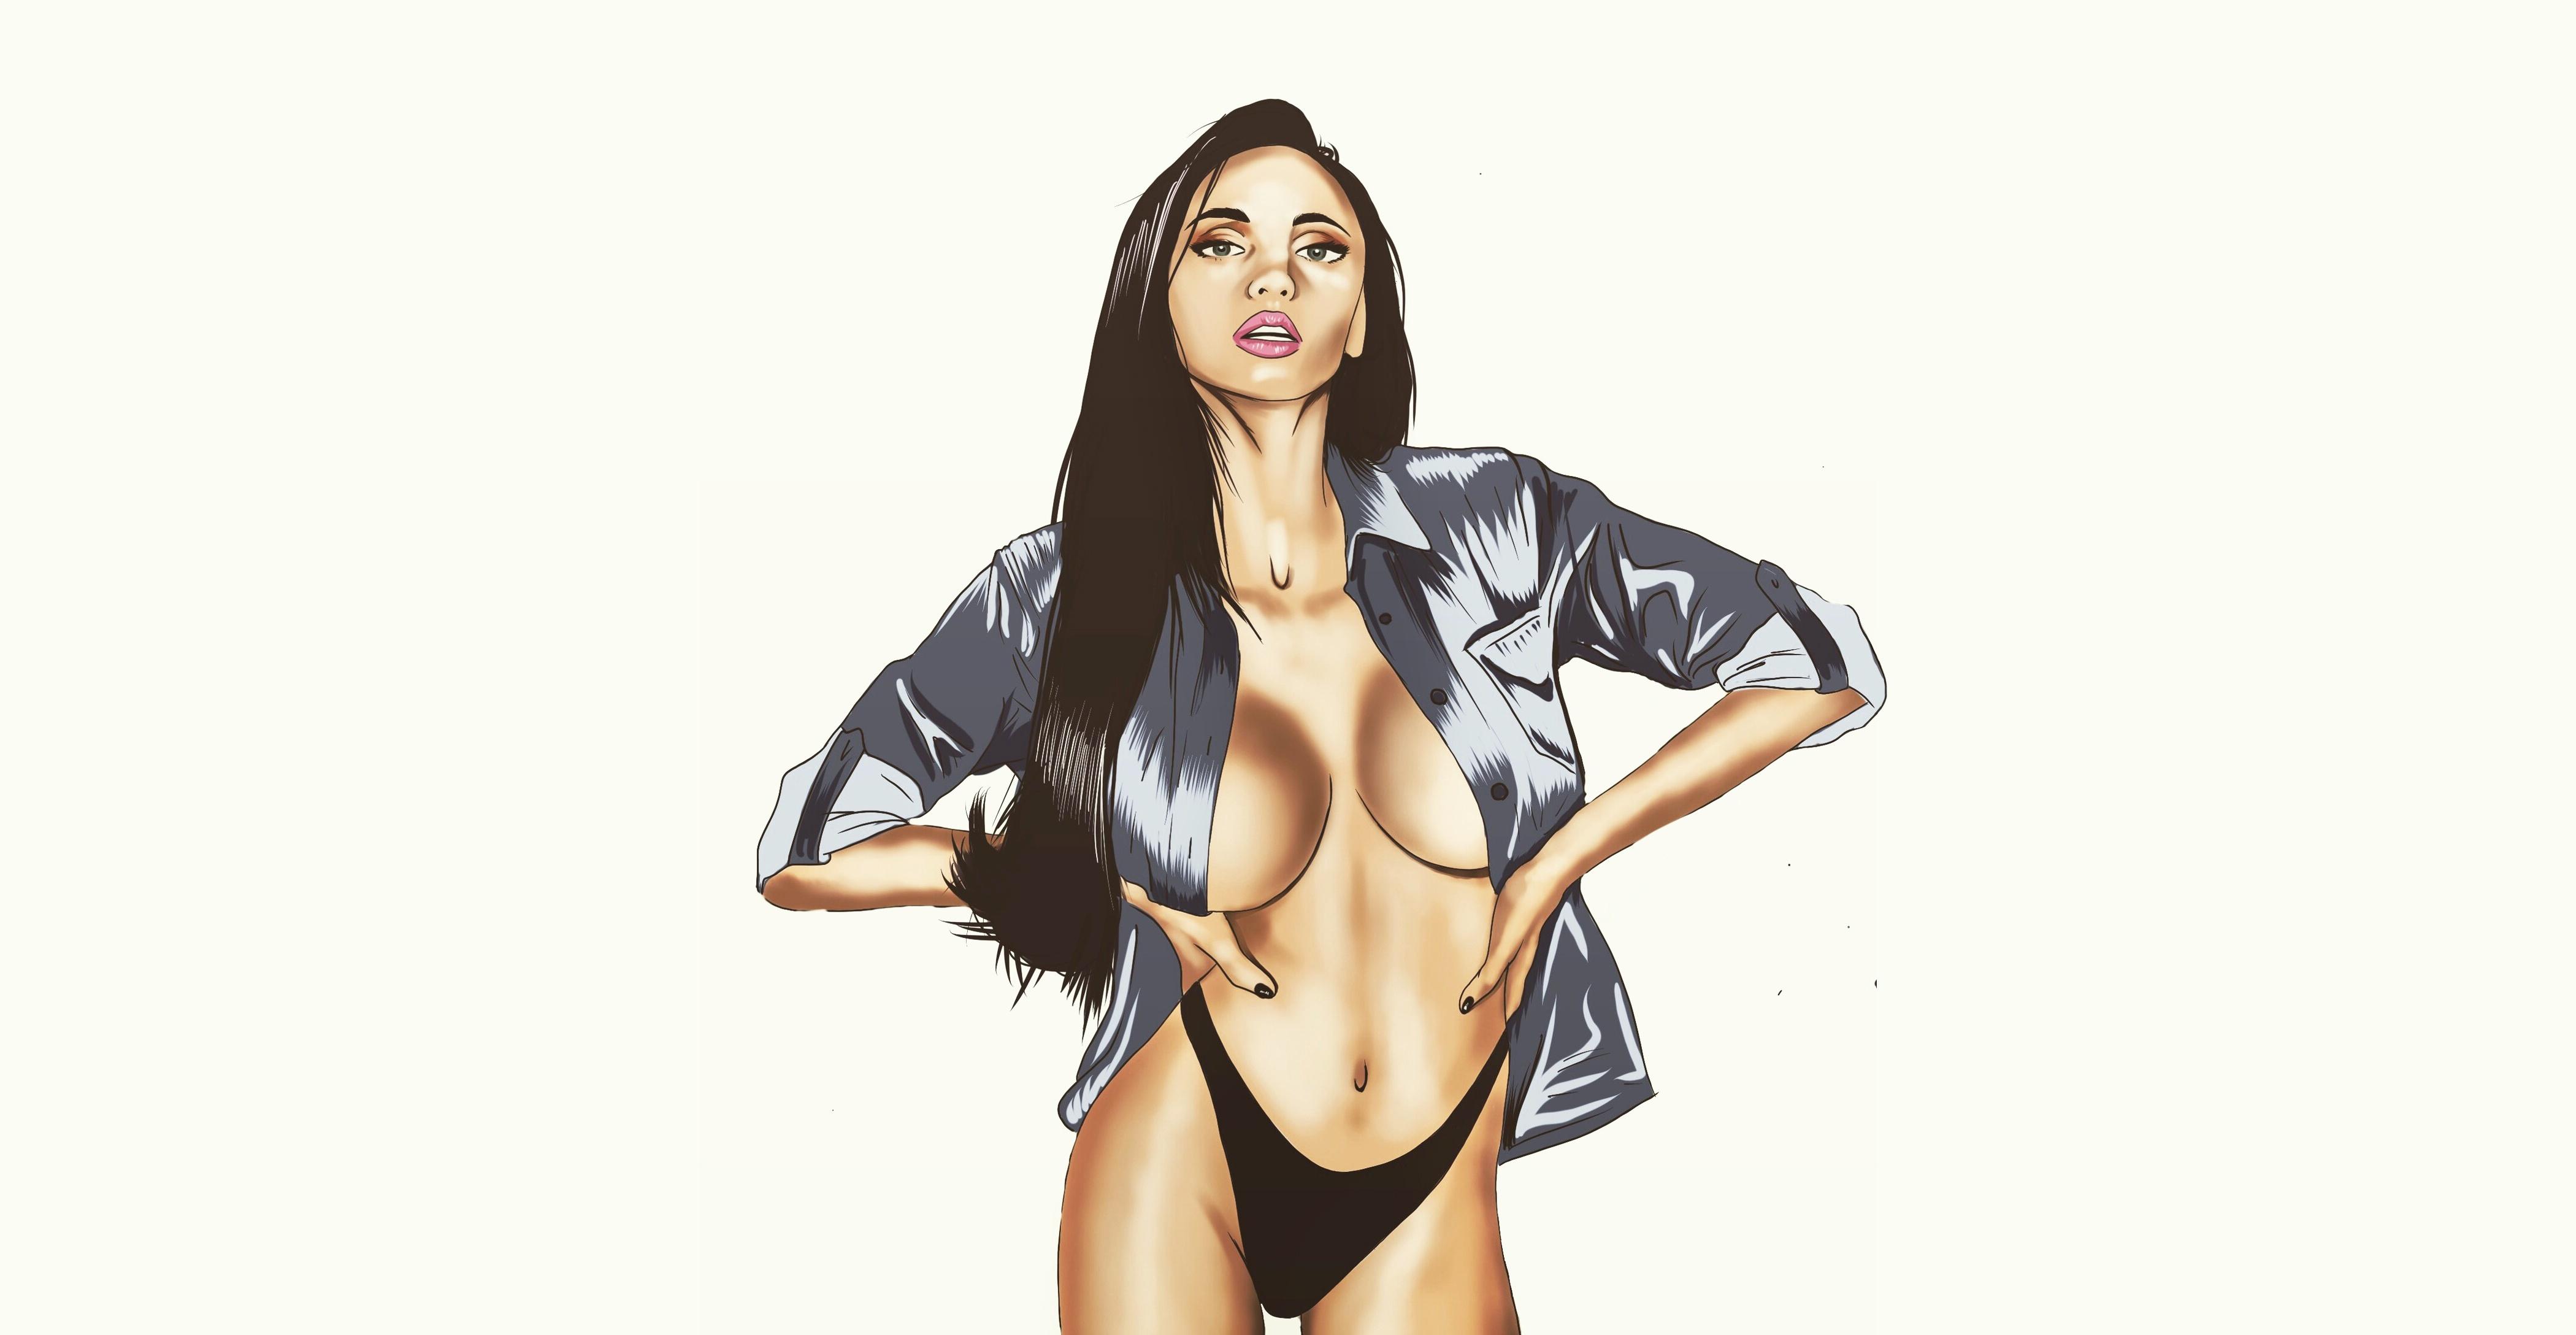 Wallpaper Big Boobs Women Artwork Black Panties Simple